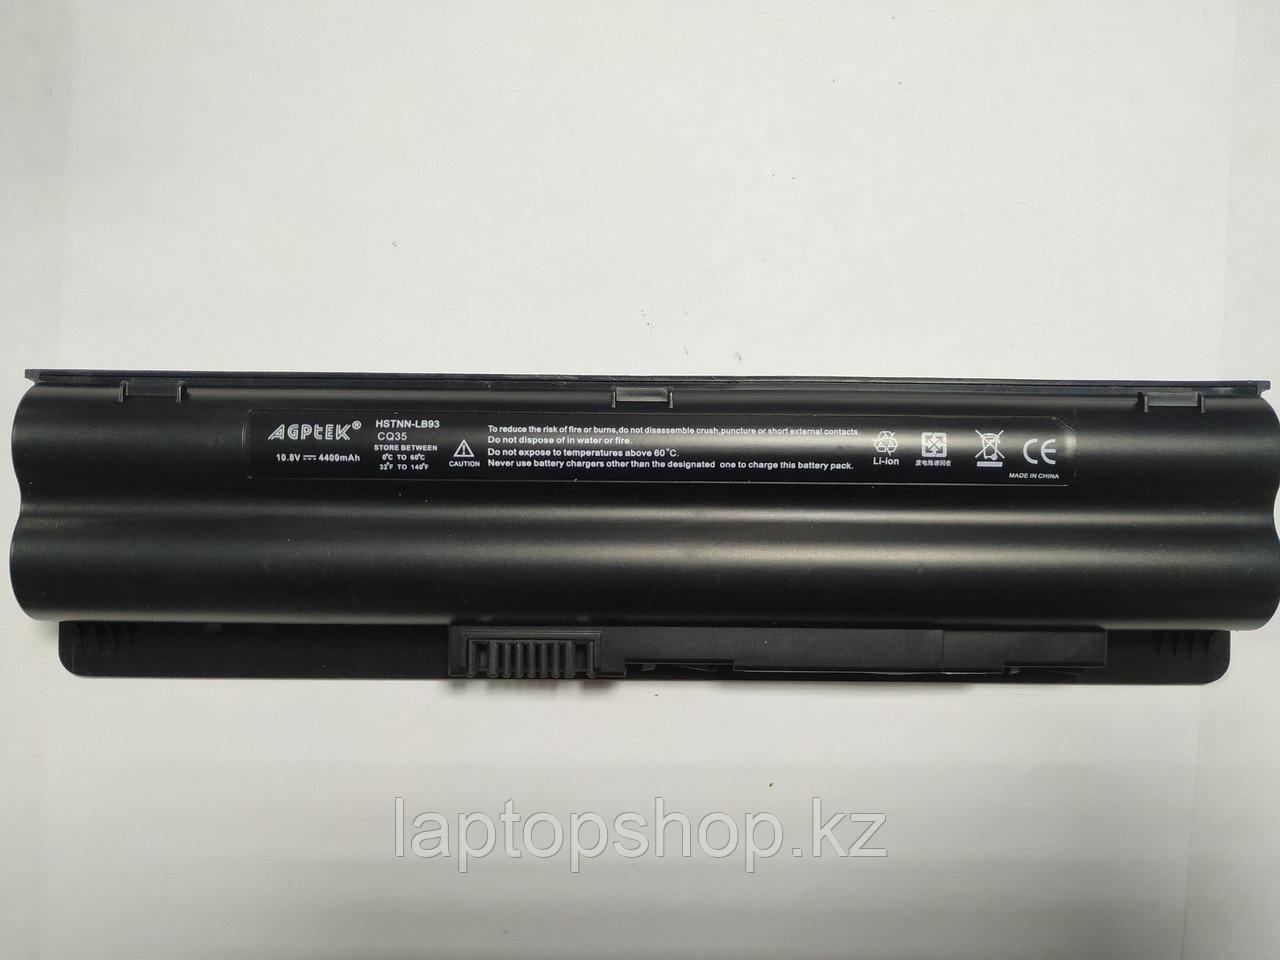 Батарея для ноутбука Совместимая for HP Pavilion dv3